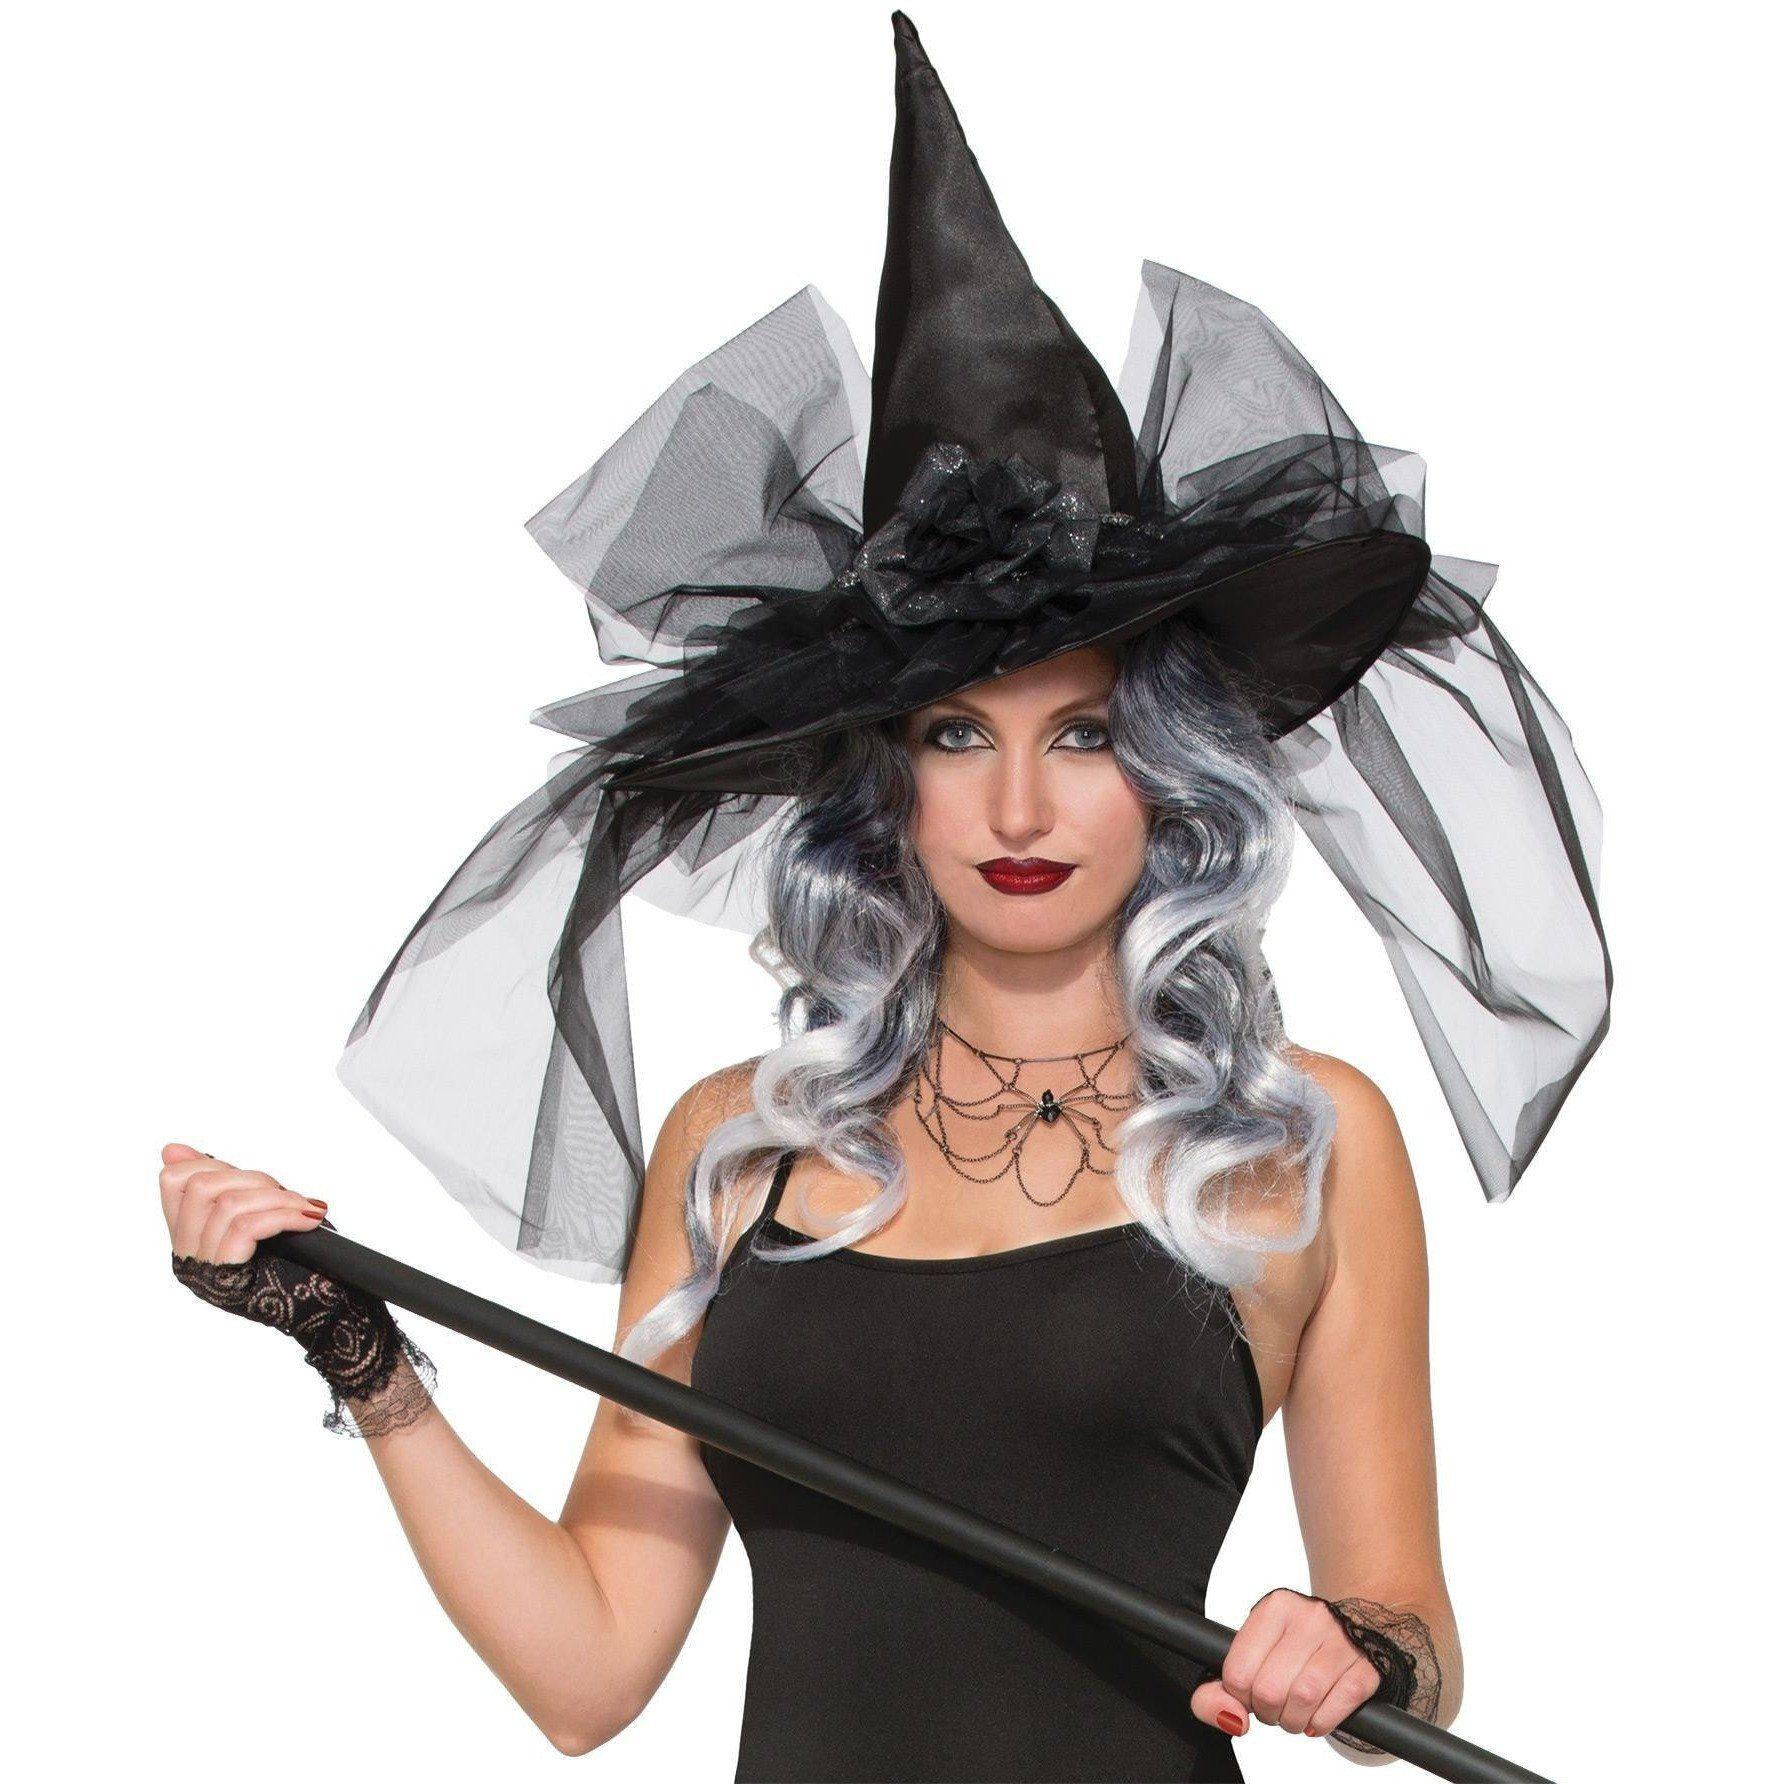 Witch Hat Fancy Deluxe Halloween costume accessories